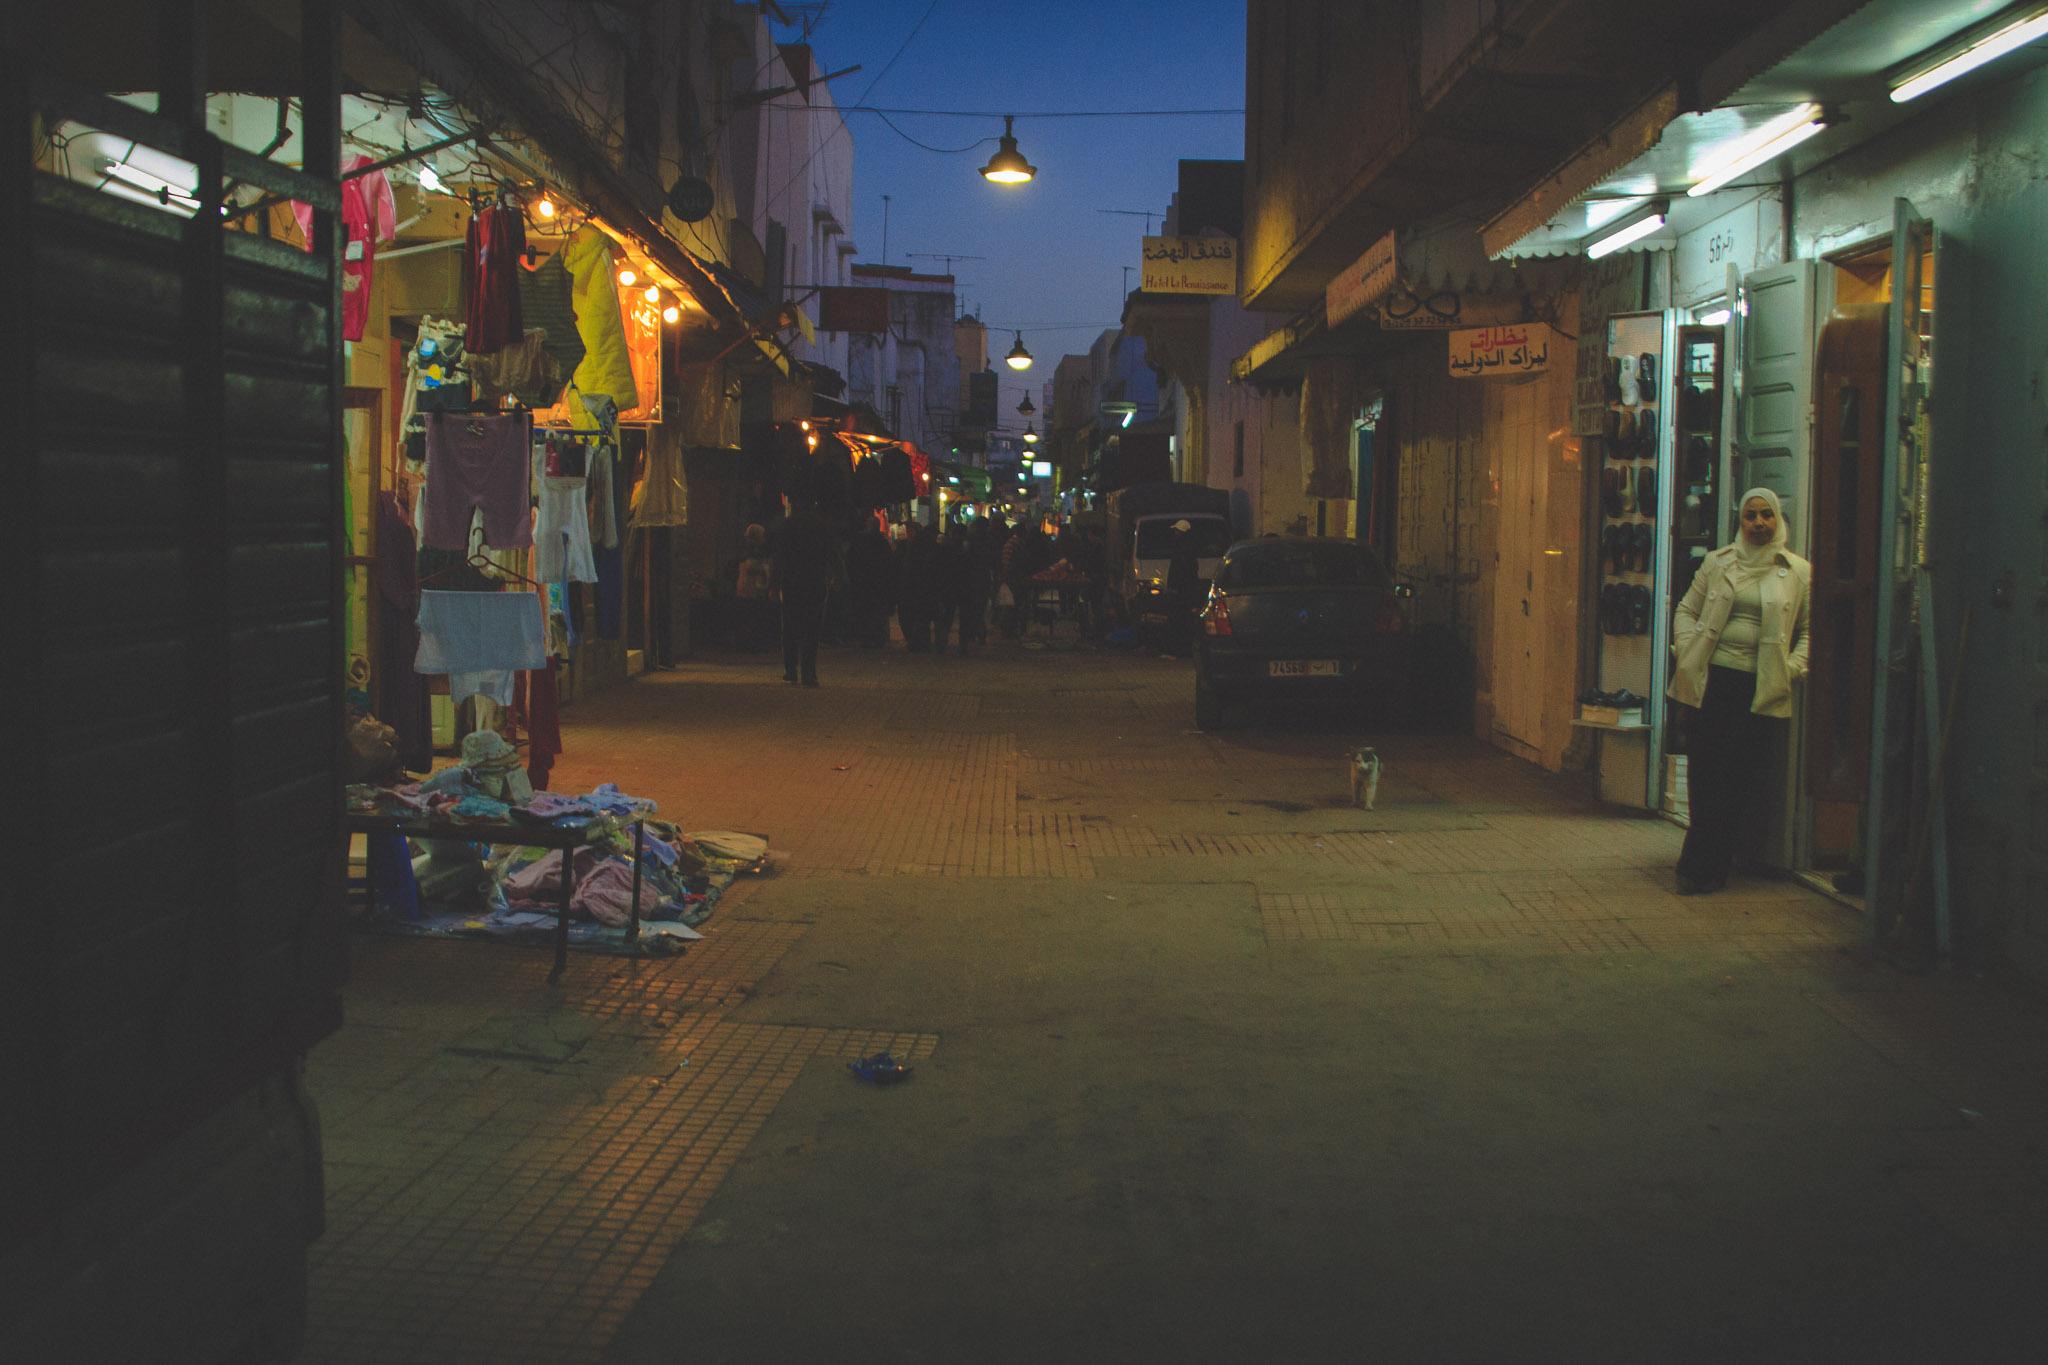 morocco_rabat_fez_casablanca_lesleyade_photography-6.jpg